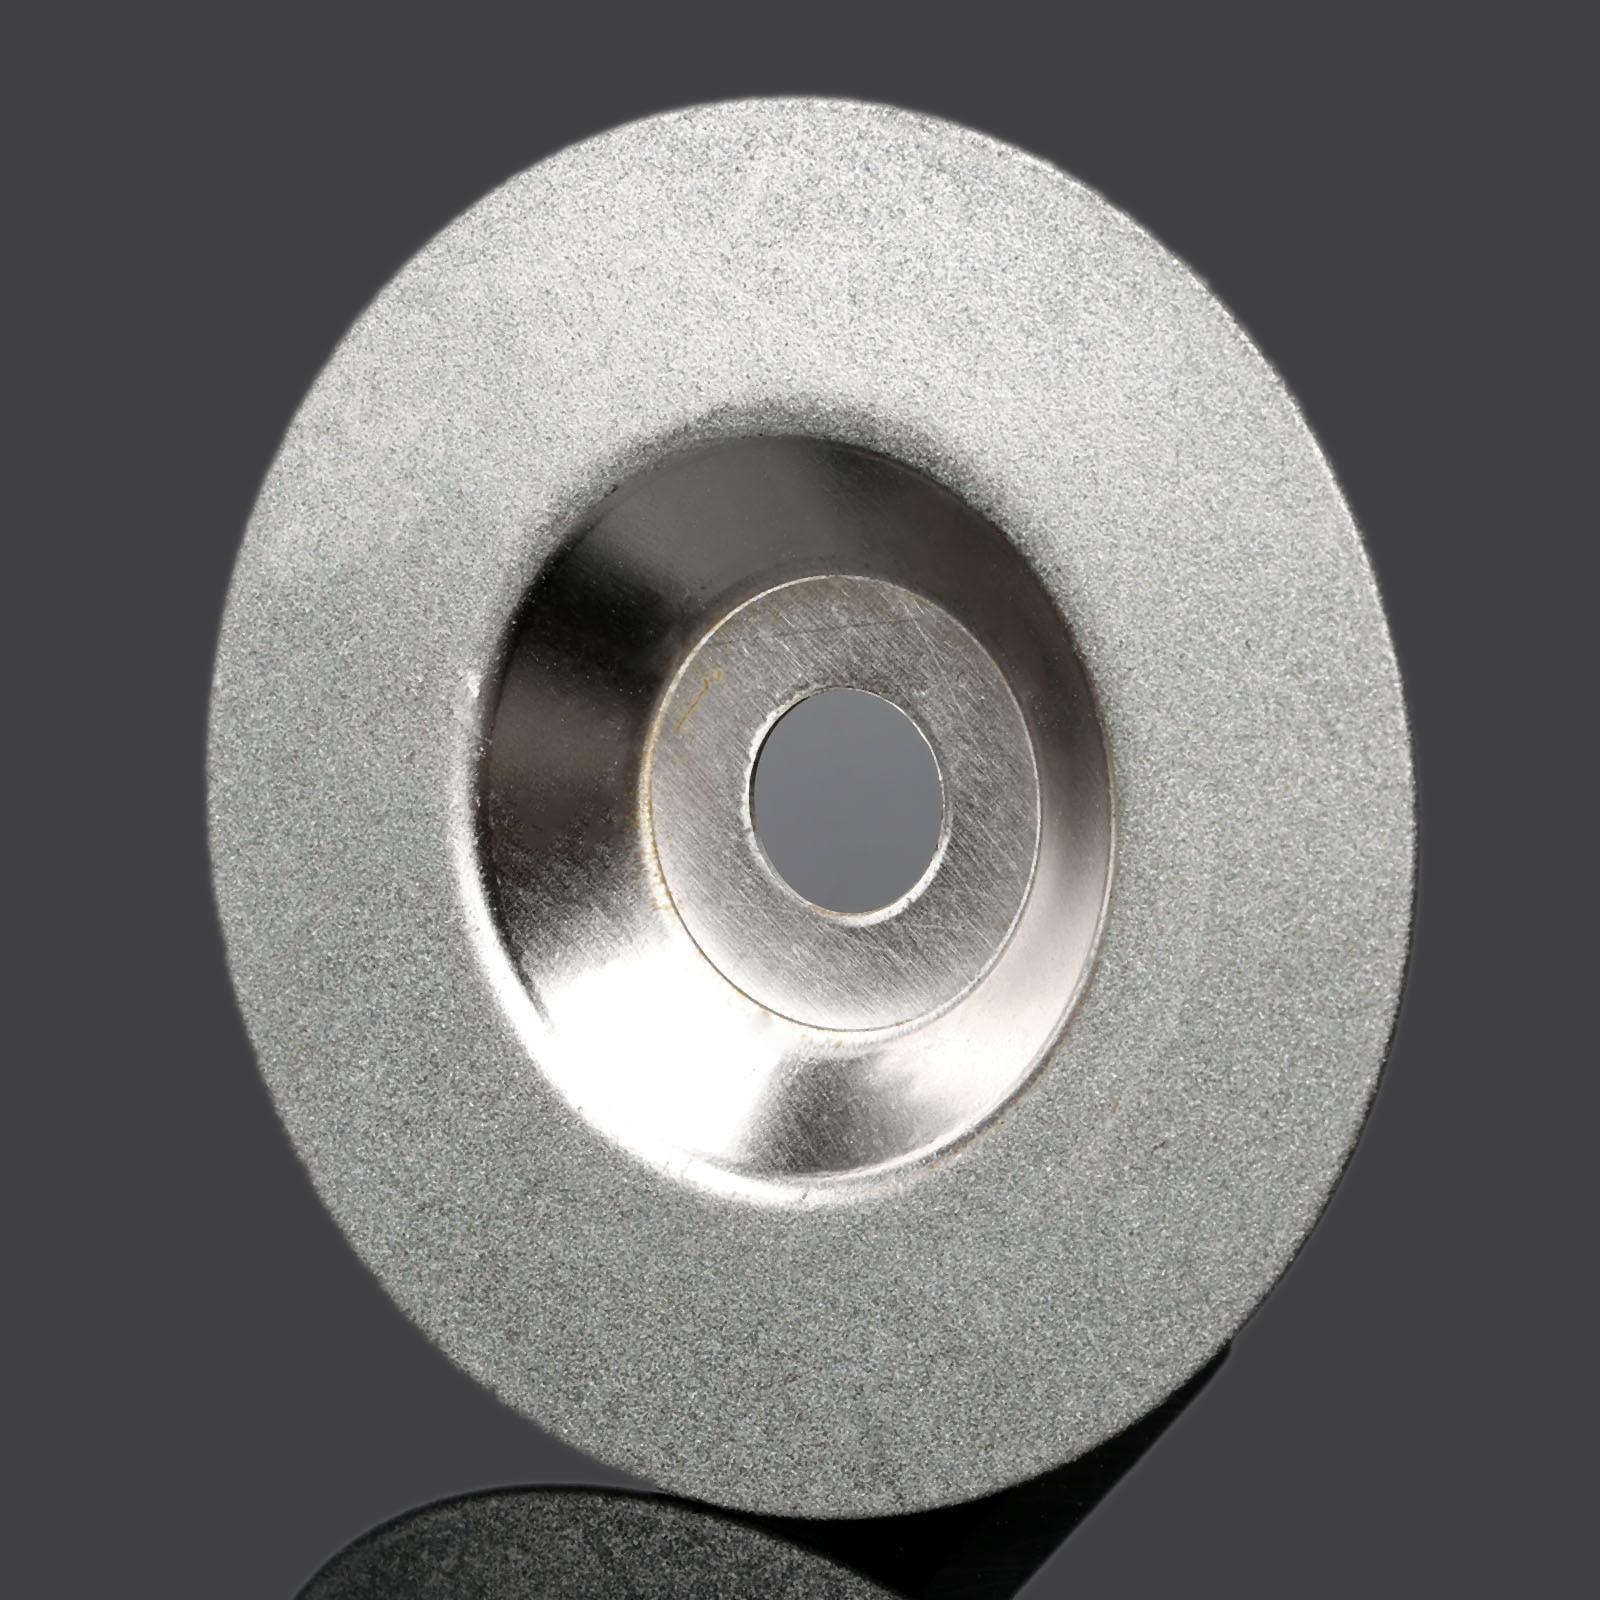 100mm Dremel Accessories Diamond Cutting Disc Grinding Polishing Wheel Disc Circular Saw Blade For Dremel Rotary Tool Power Tool